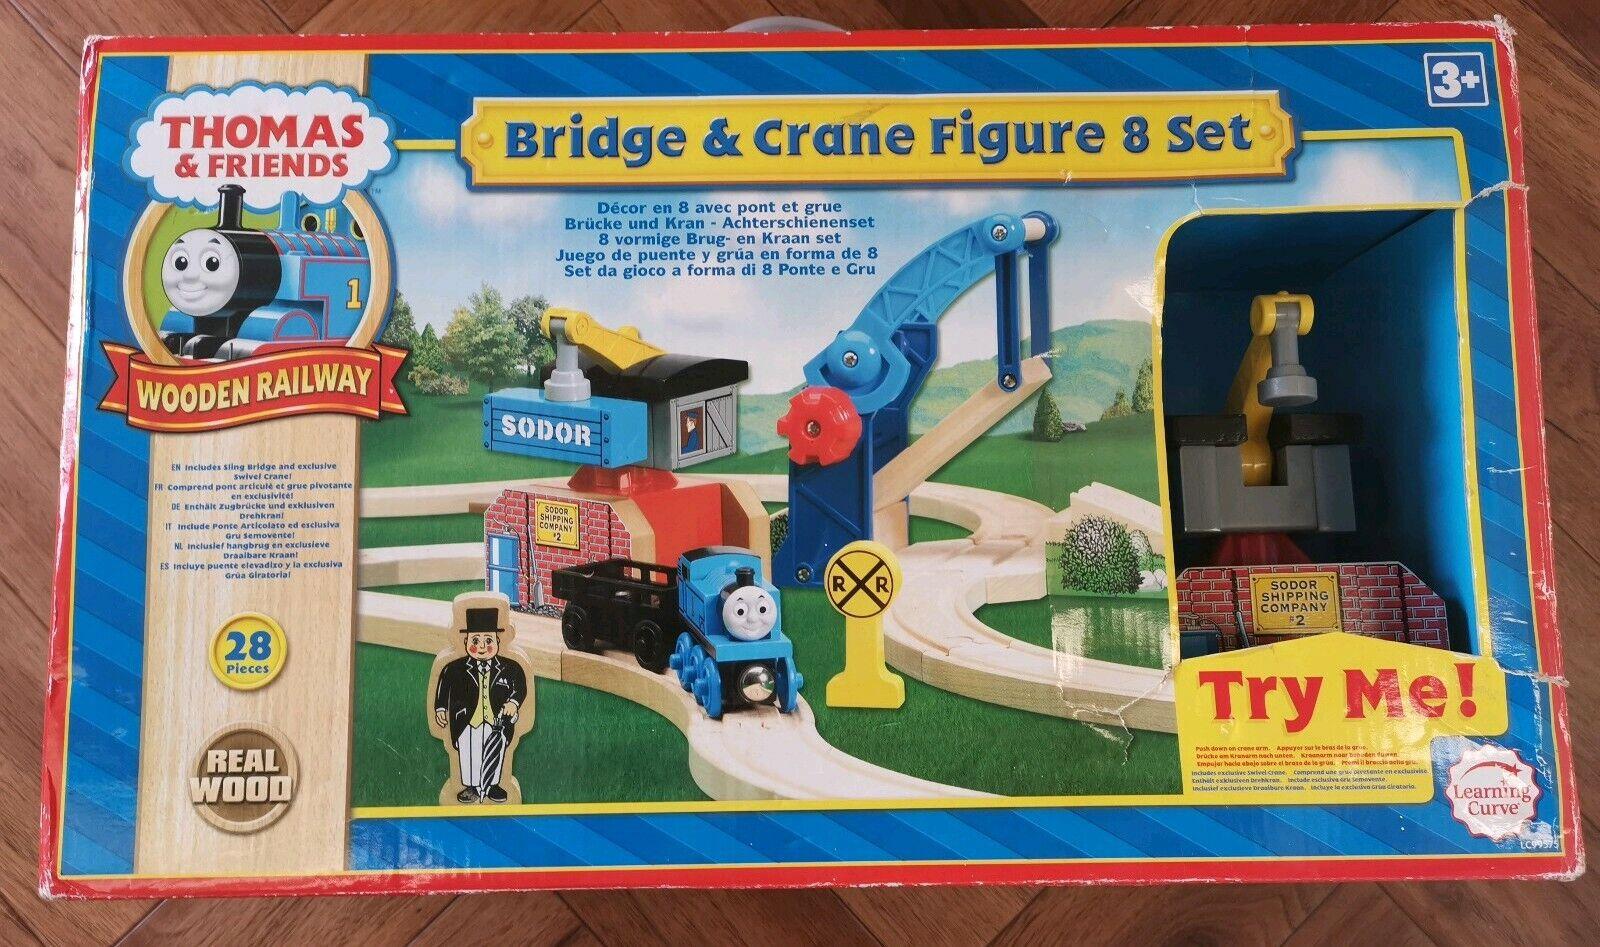 THOMAS the Tank Engine Bridge & Crane Figure 8 Set, Holzen railway train tracks